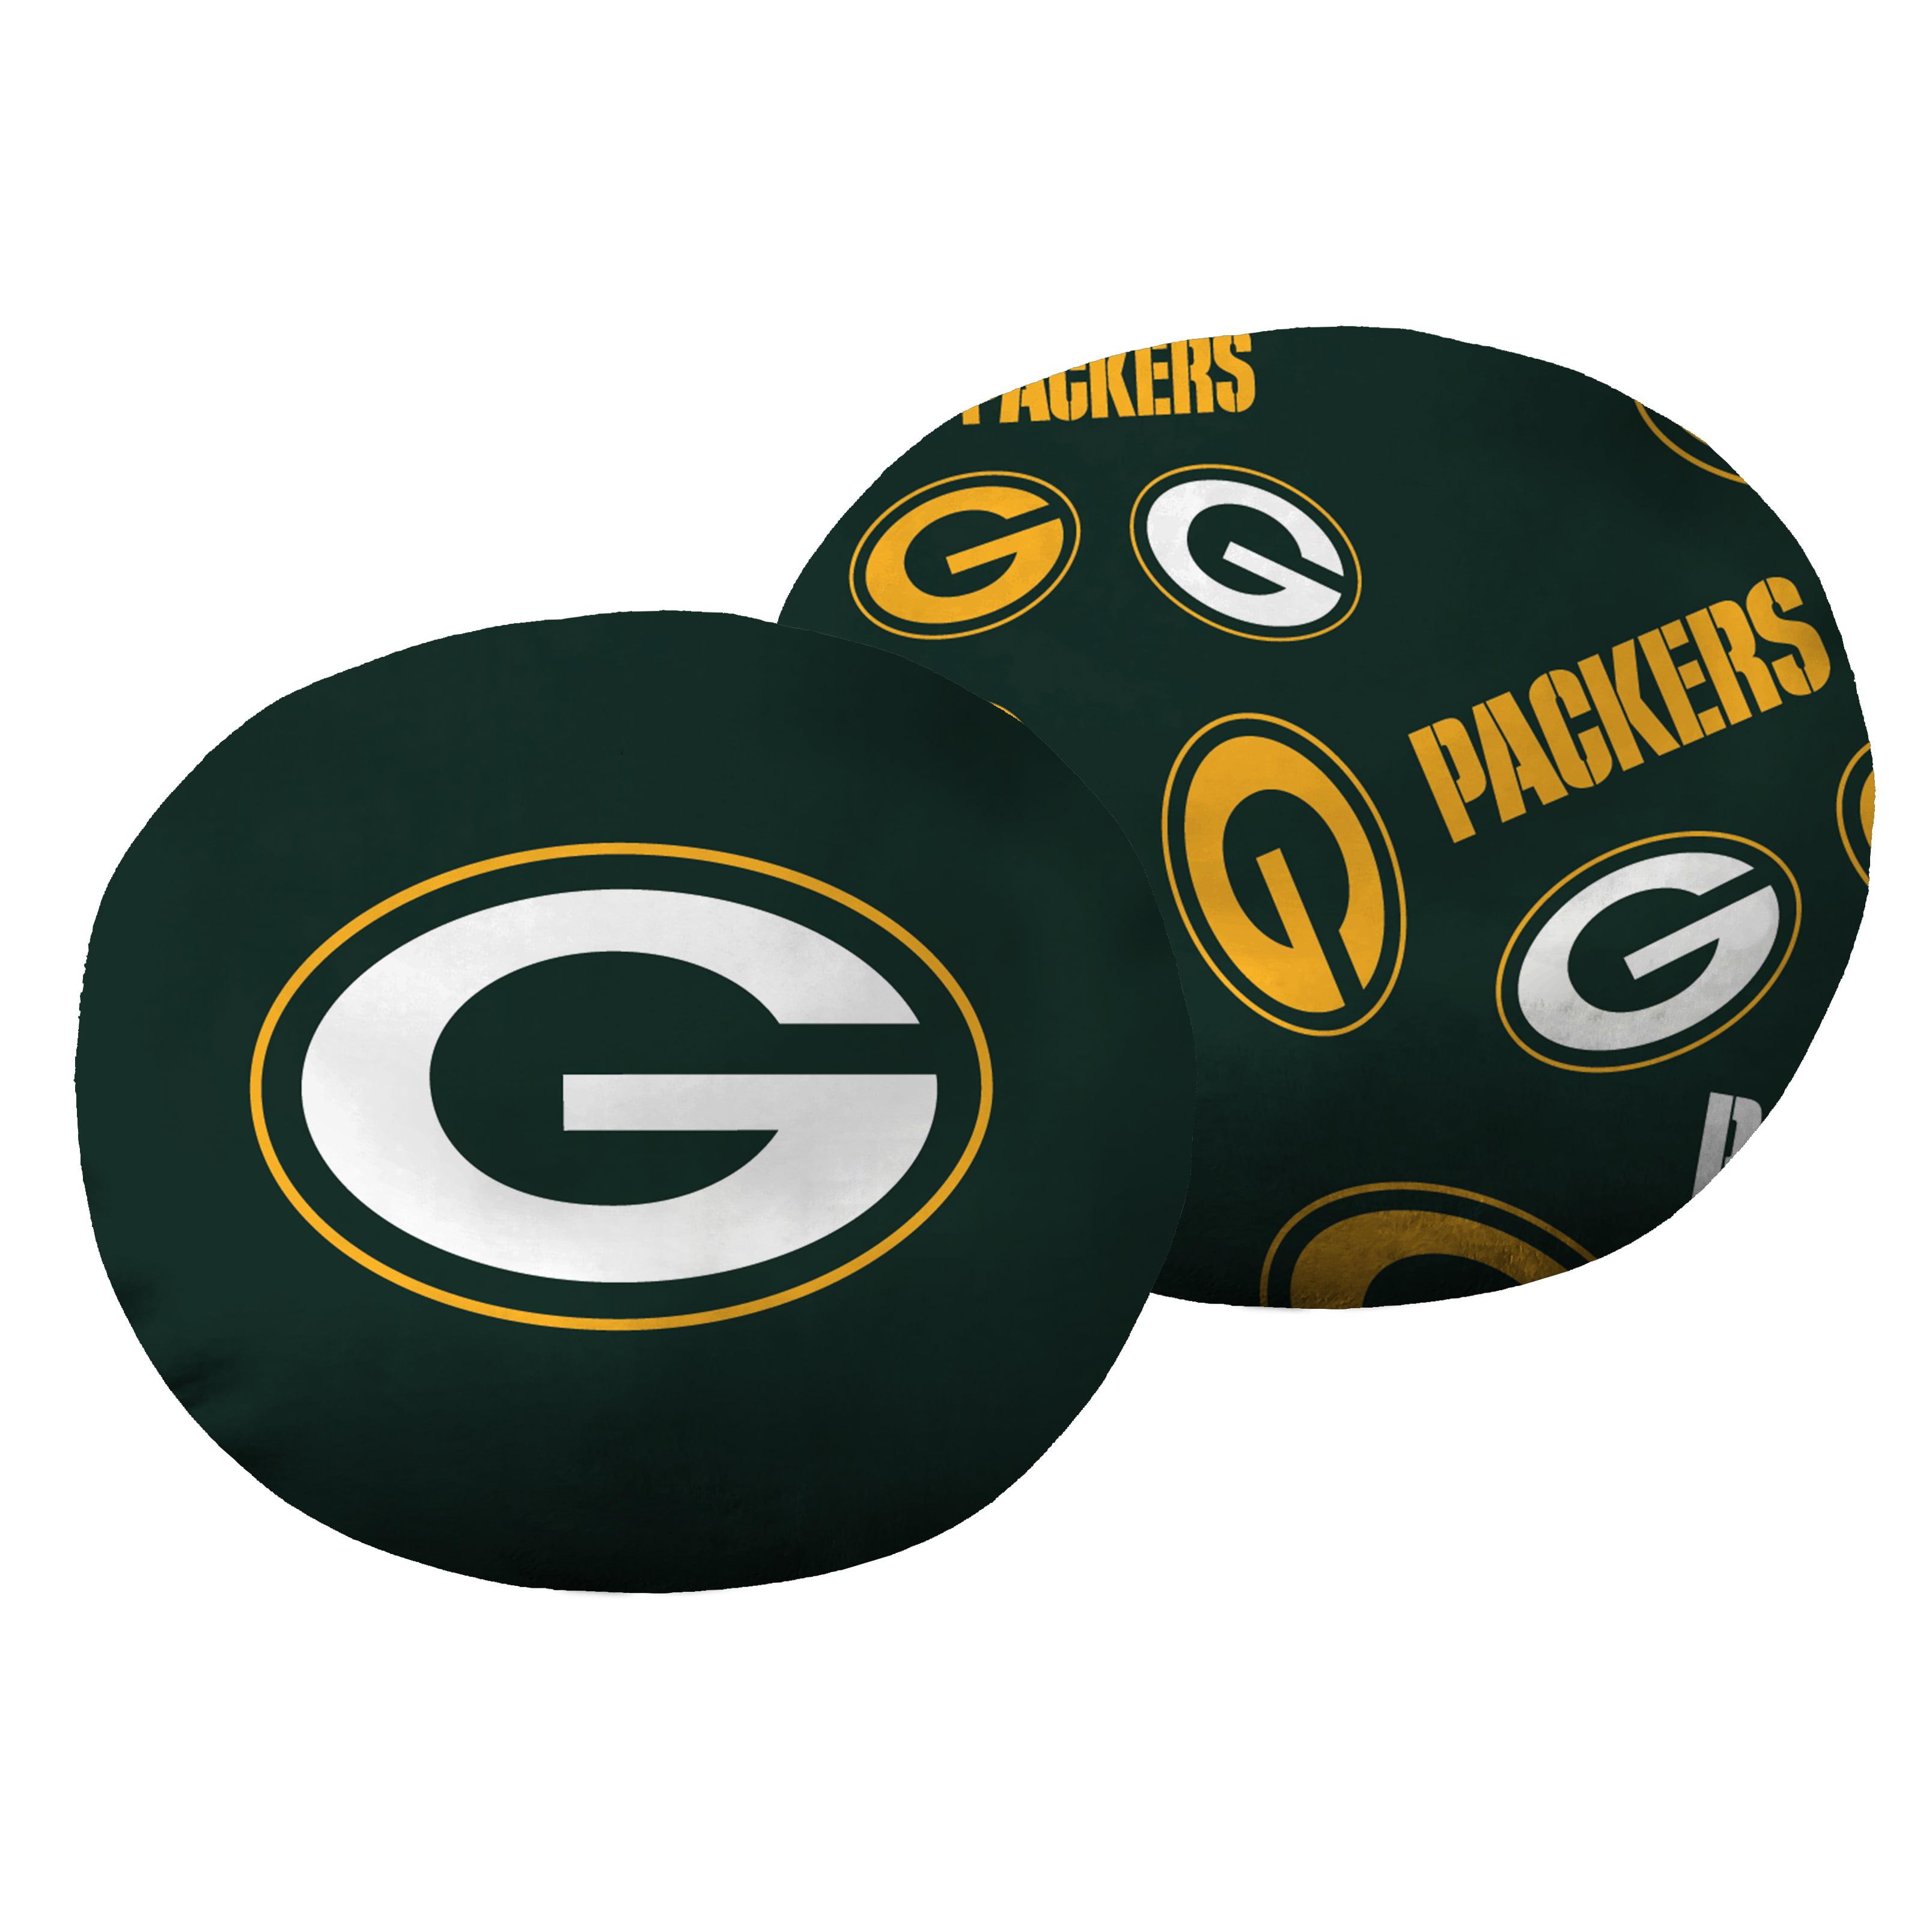 "NFL - Green Bay Packers, 11"" Cloud Pillow"